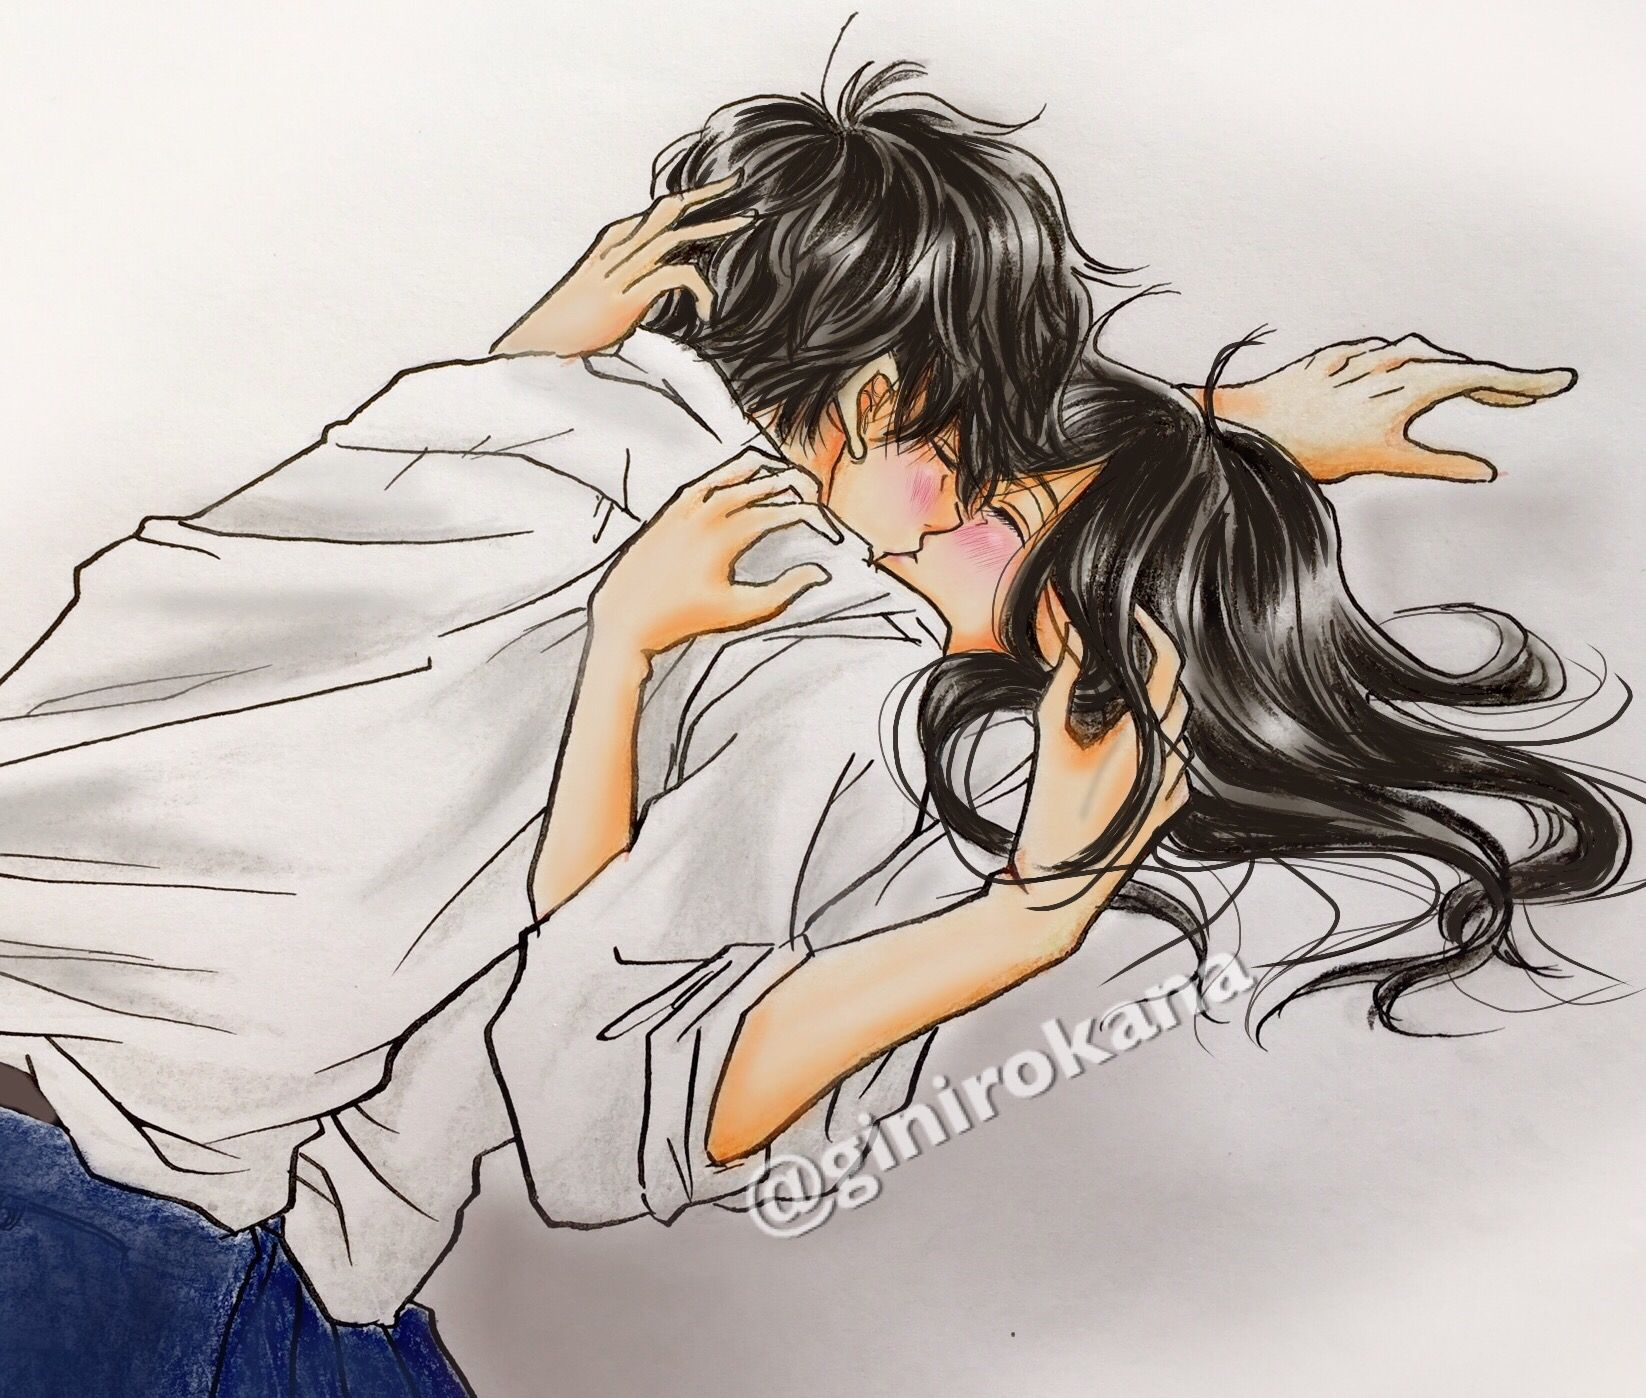 ginirokana kiss キス 高校生 可愛い カップル 恋人 制服 | 恋人イラスト